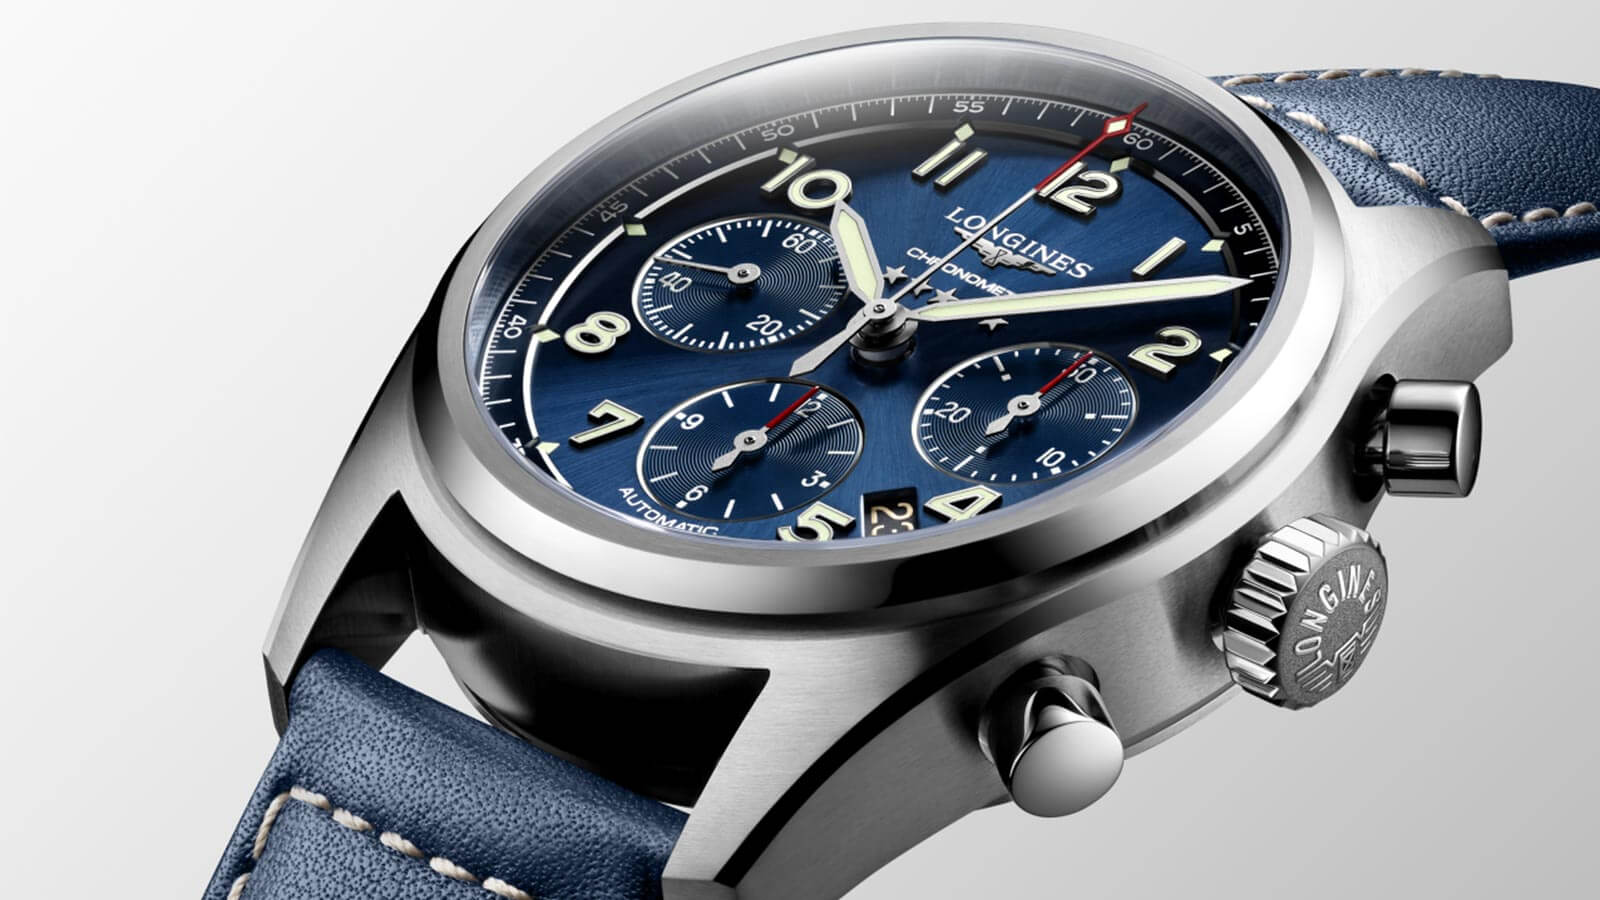 Longines Spirit Chronograph mit Chronometer-Zertifizierung